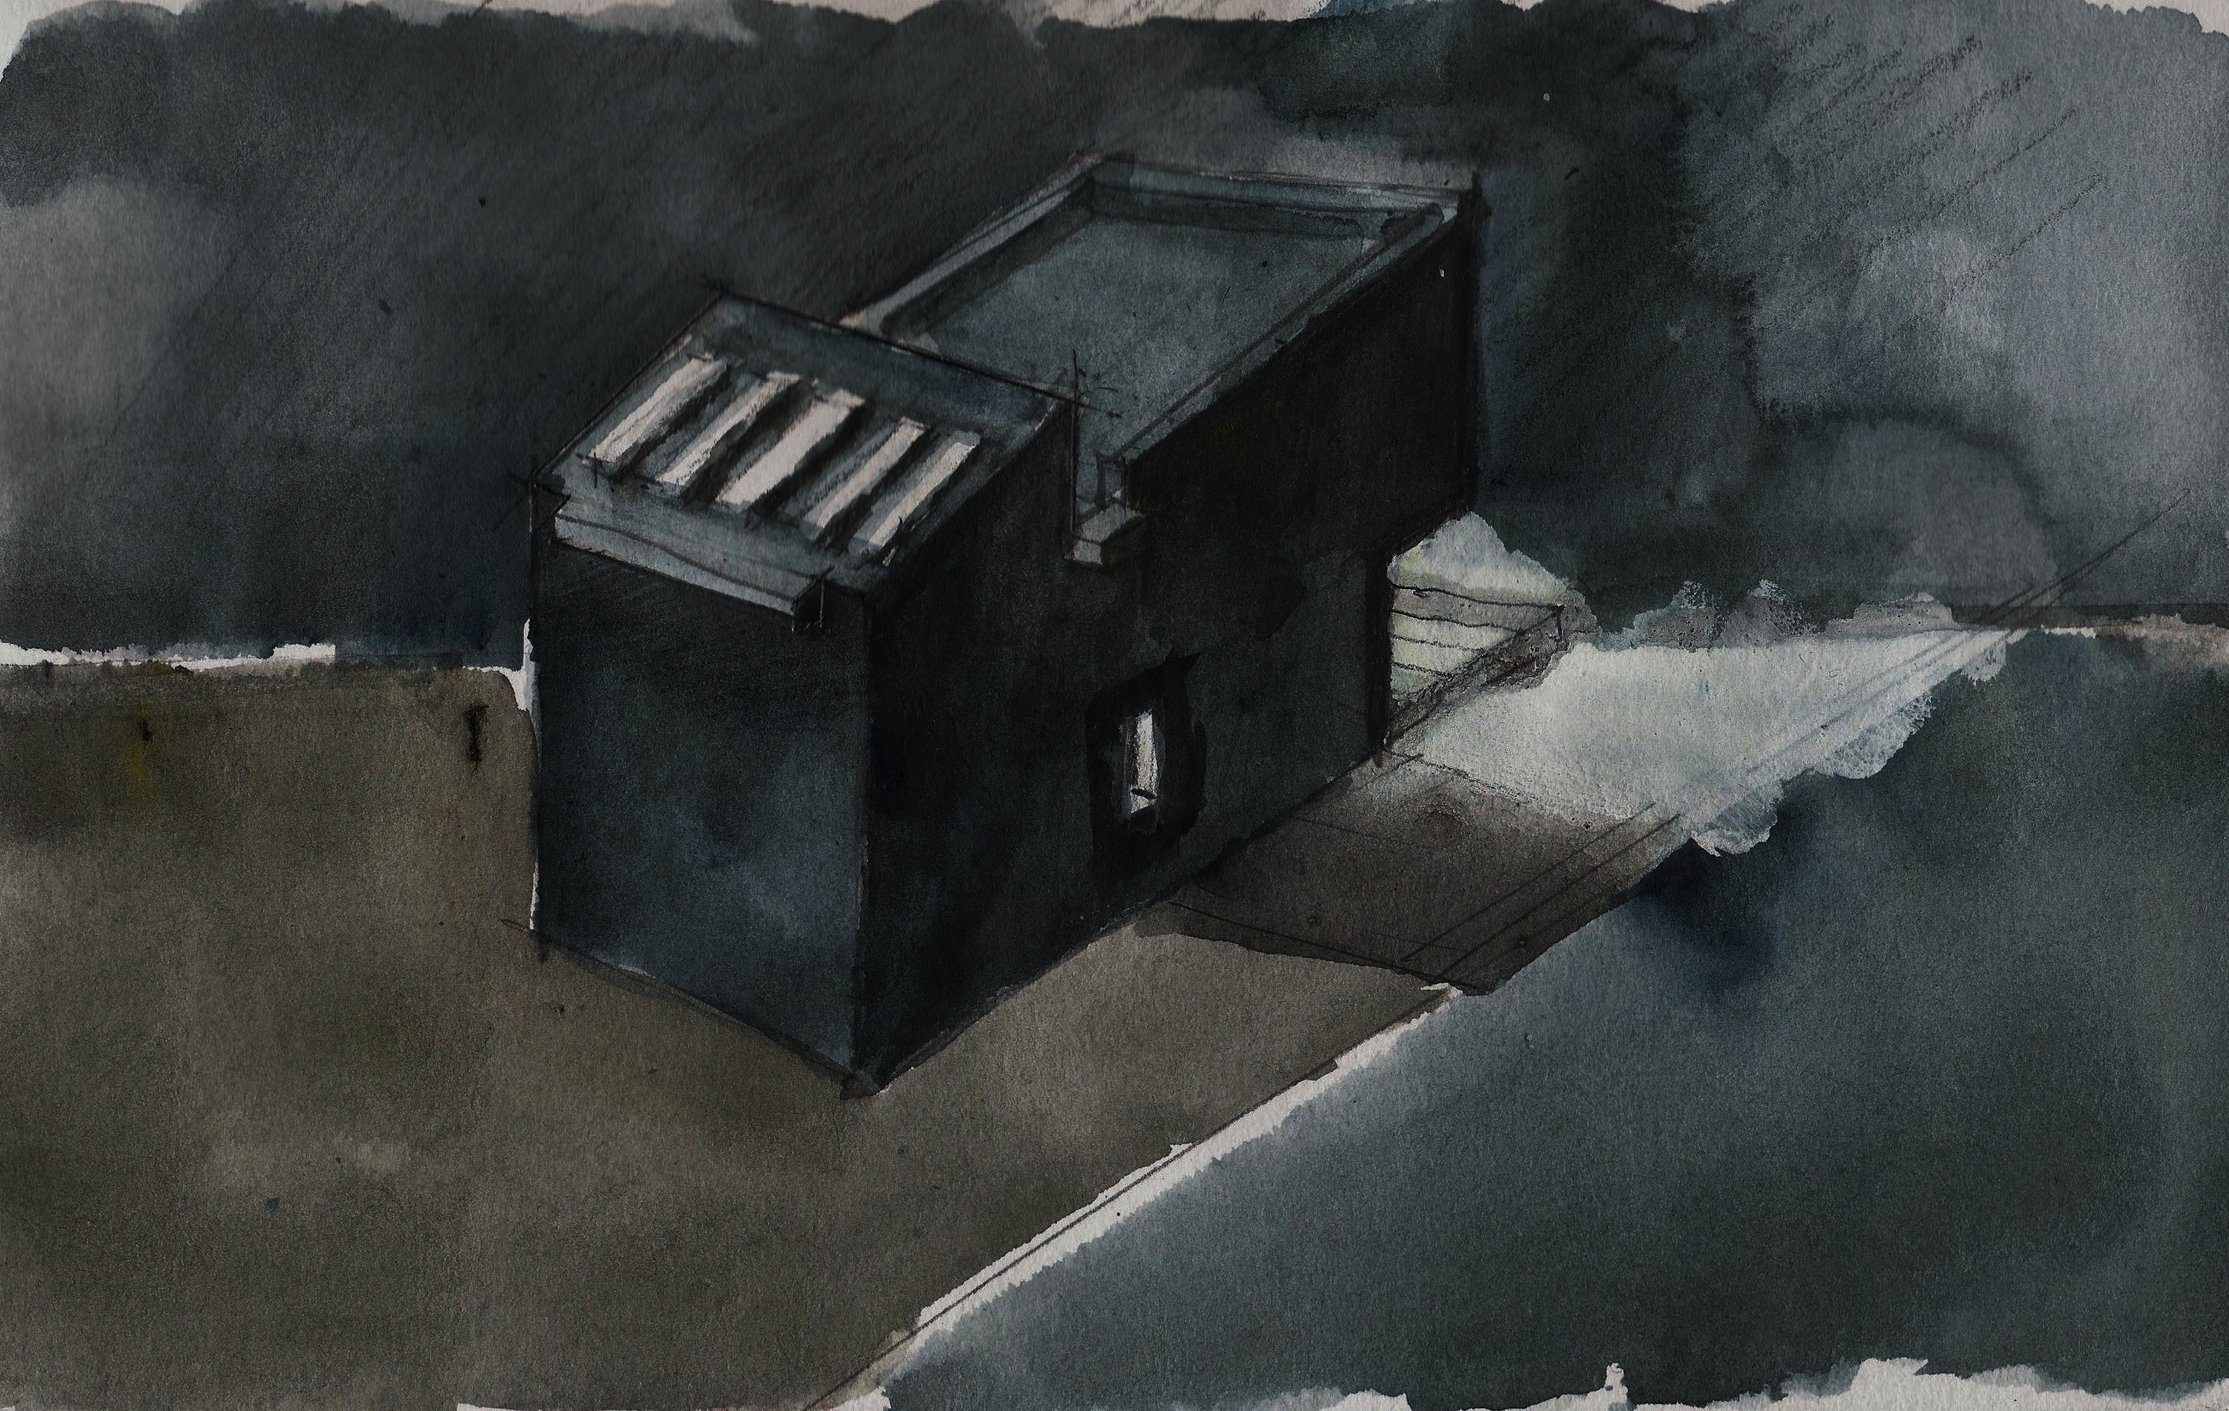 2012.02.12 T_S sketch 001.jpg